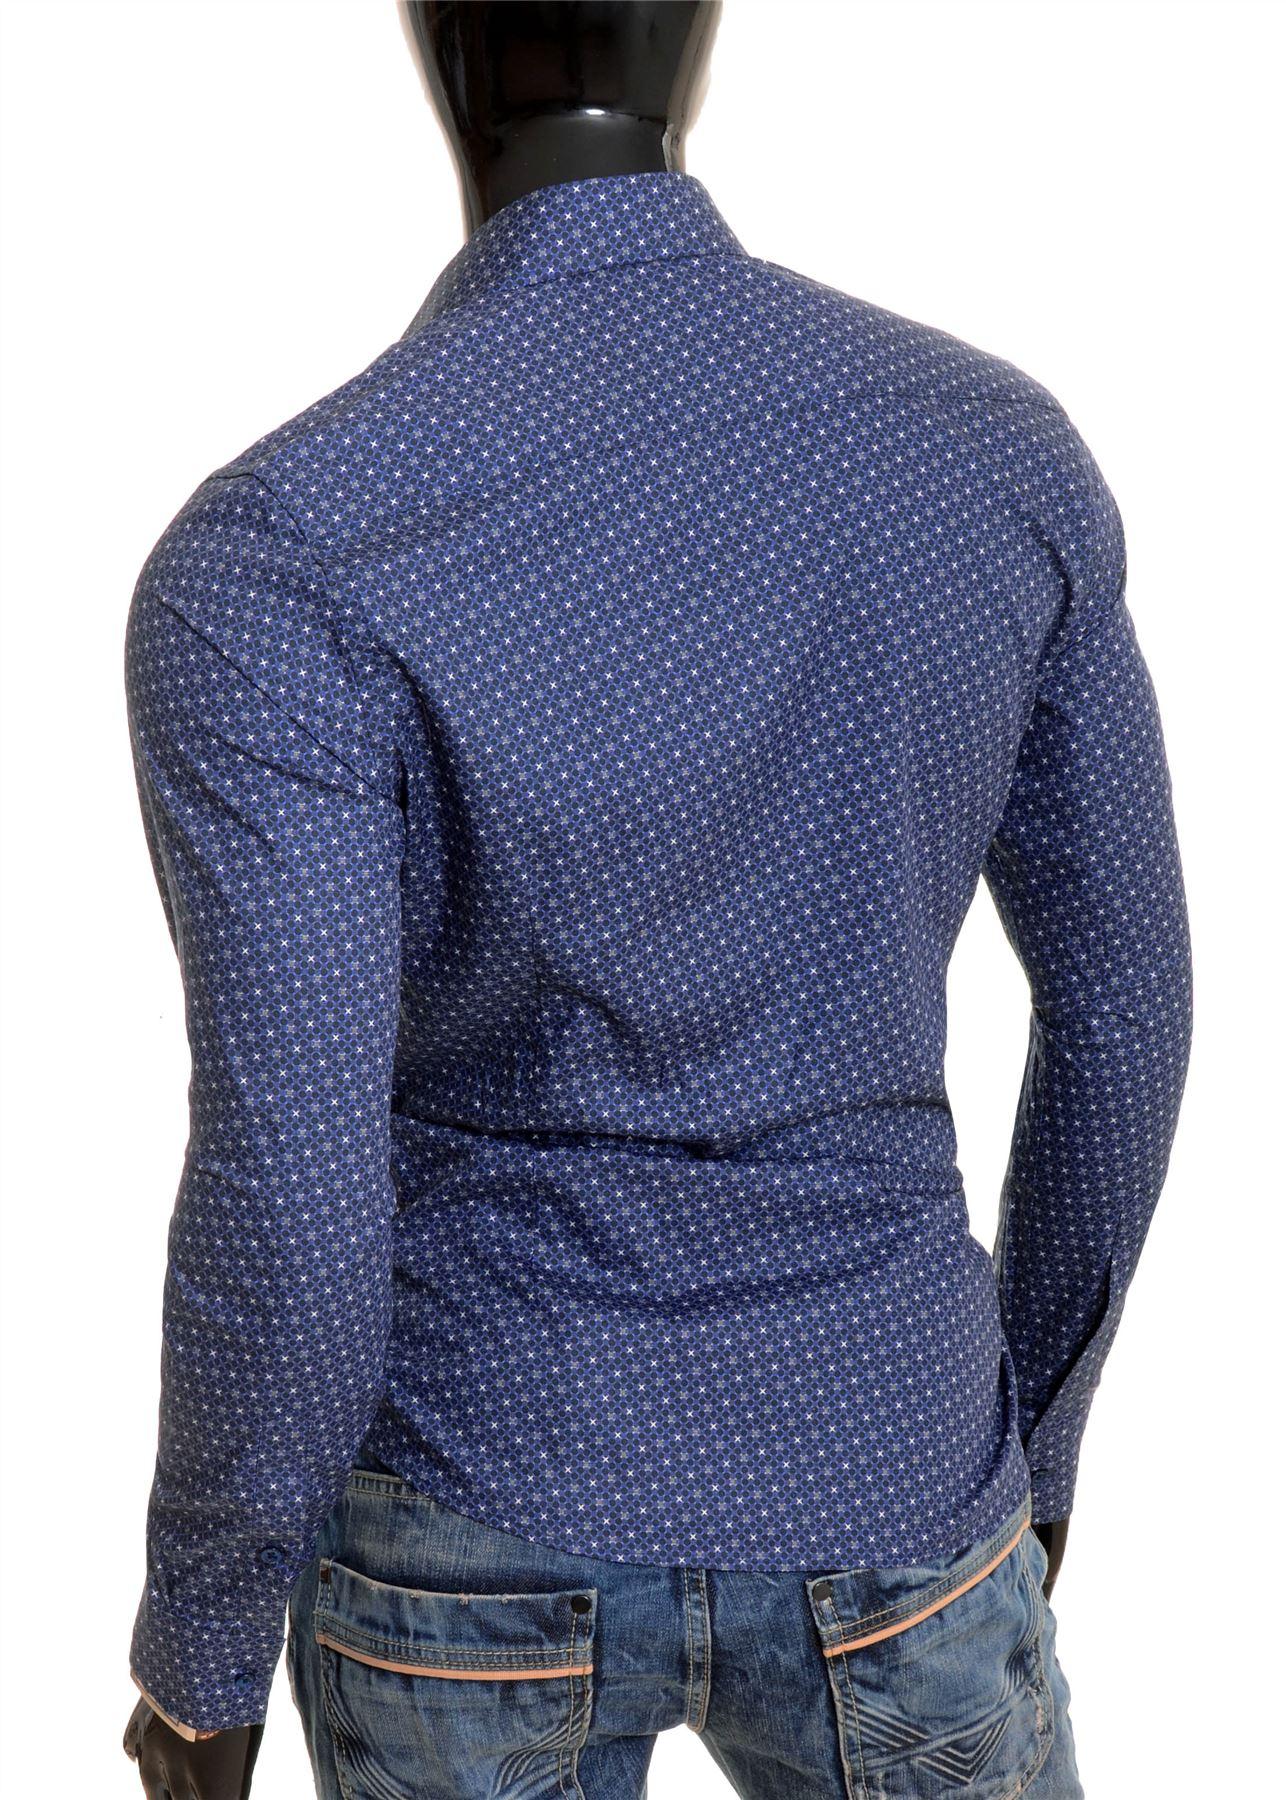 Cipo /& Baxx Men/'s Elegant Shirt Dark Blue Classic Spotted Pattern Cotton Slim